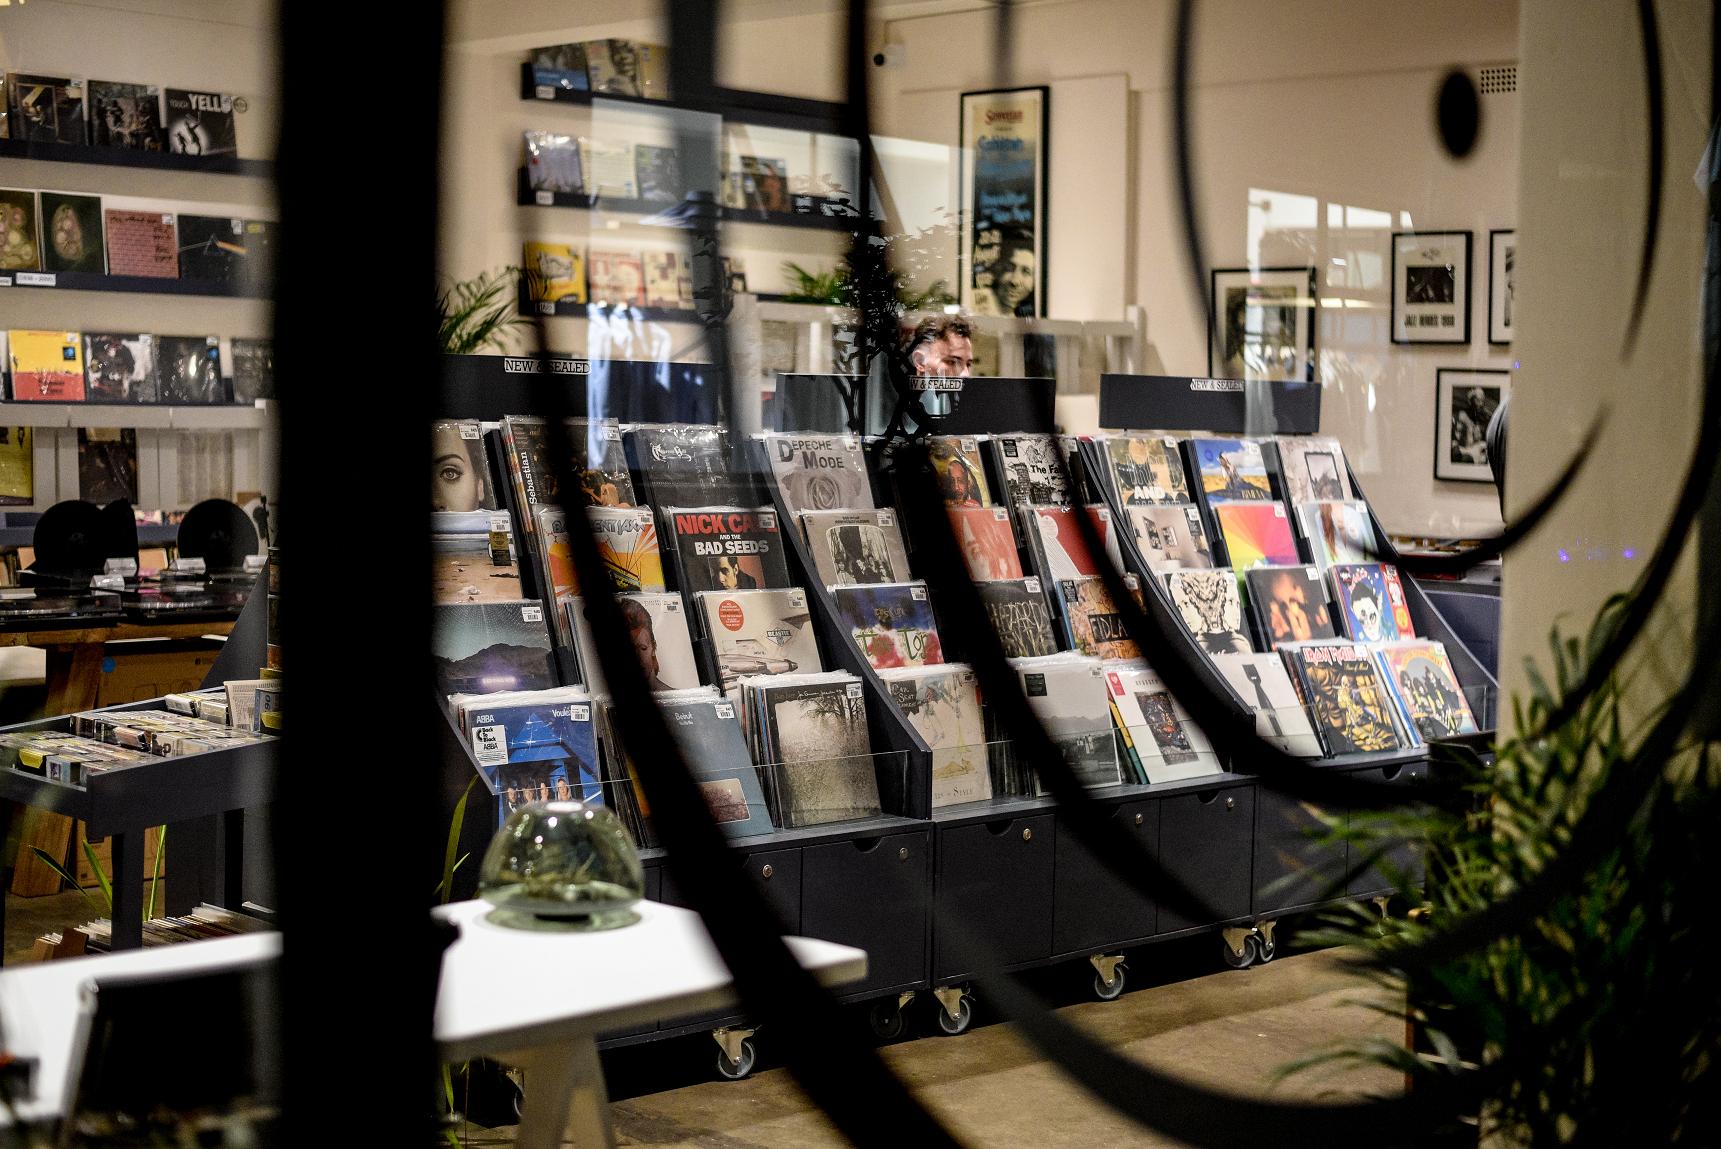 recordstoreday3.png